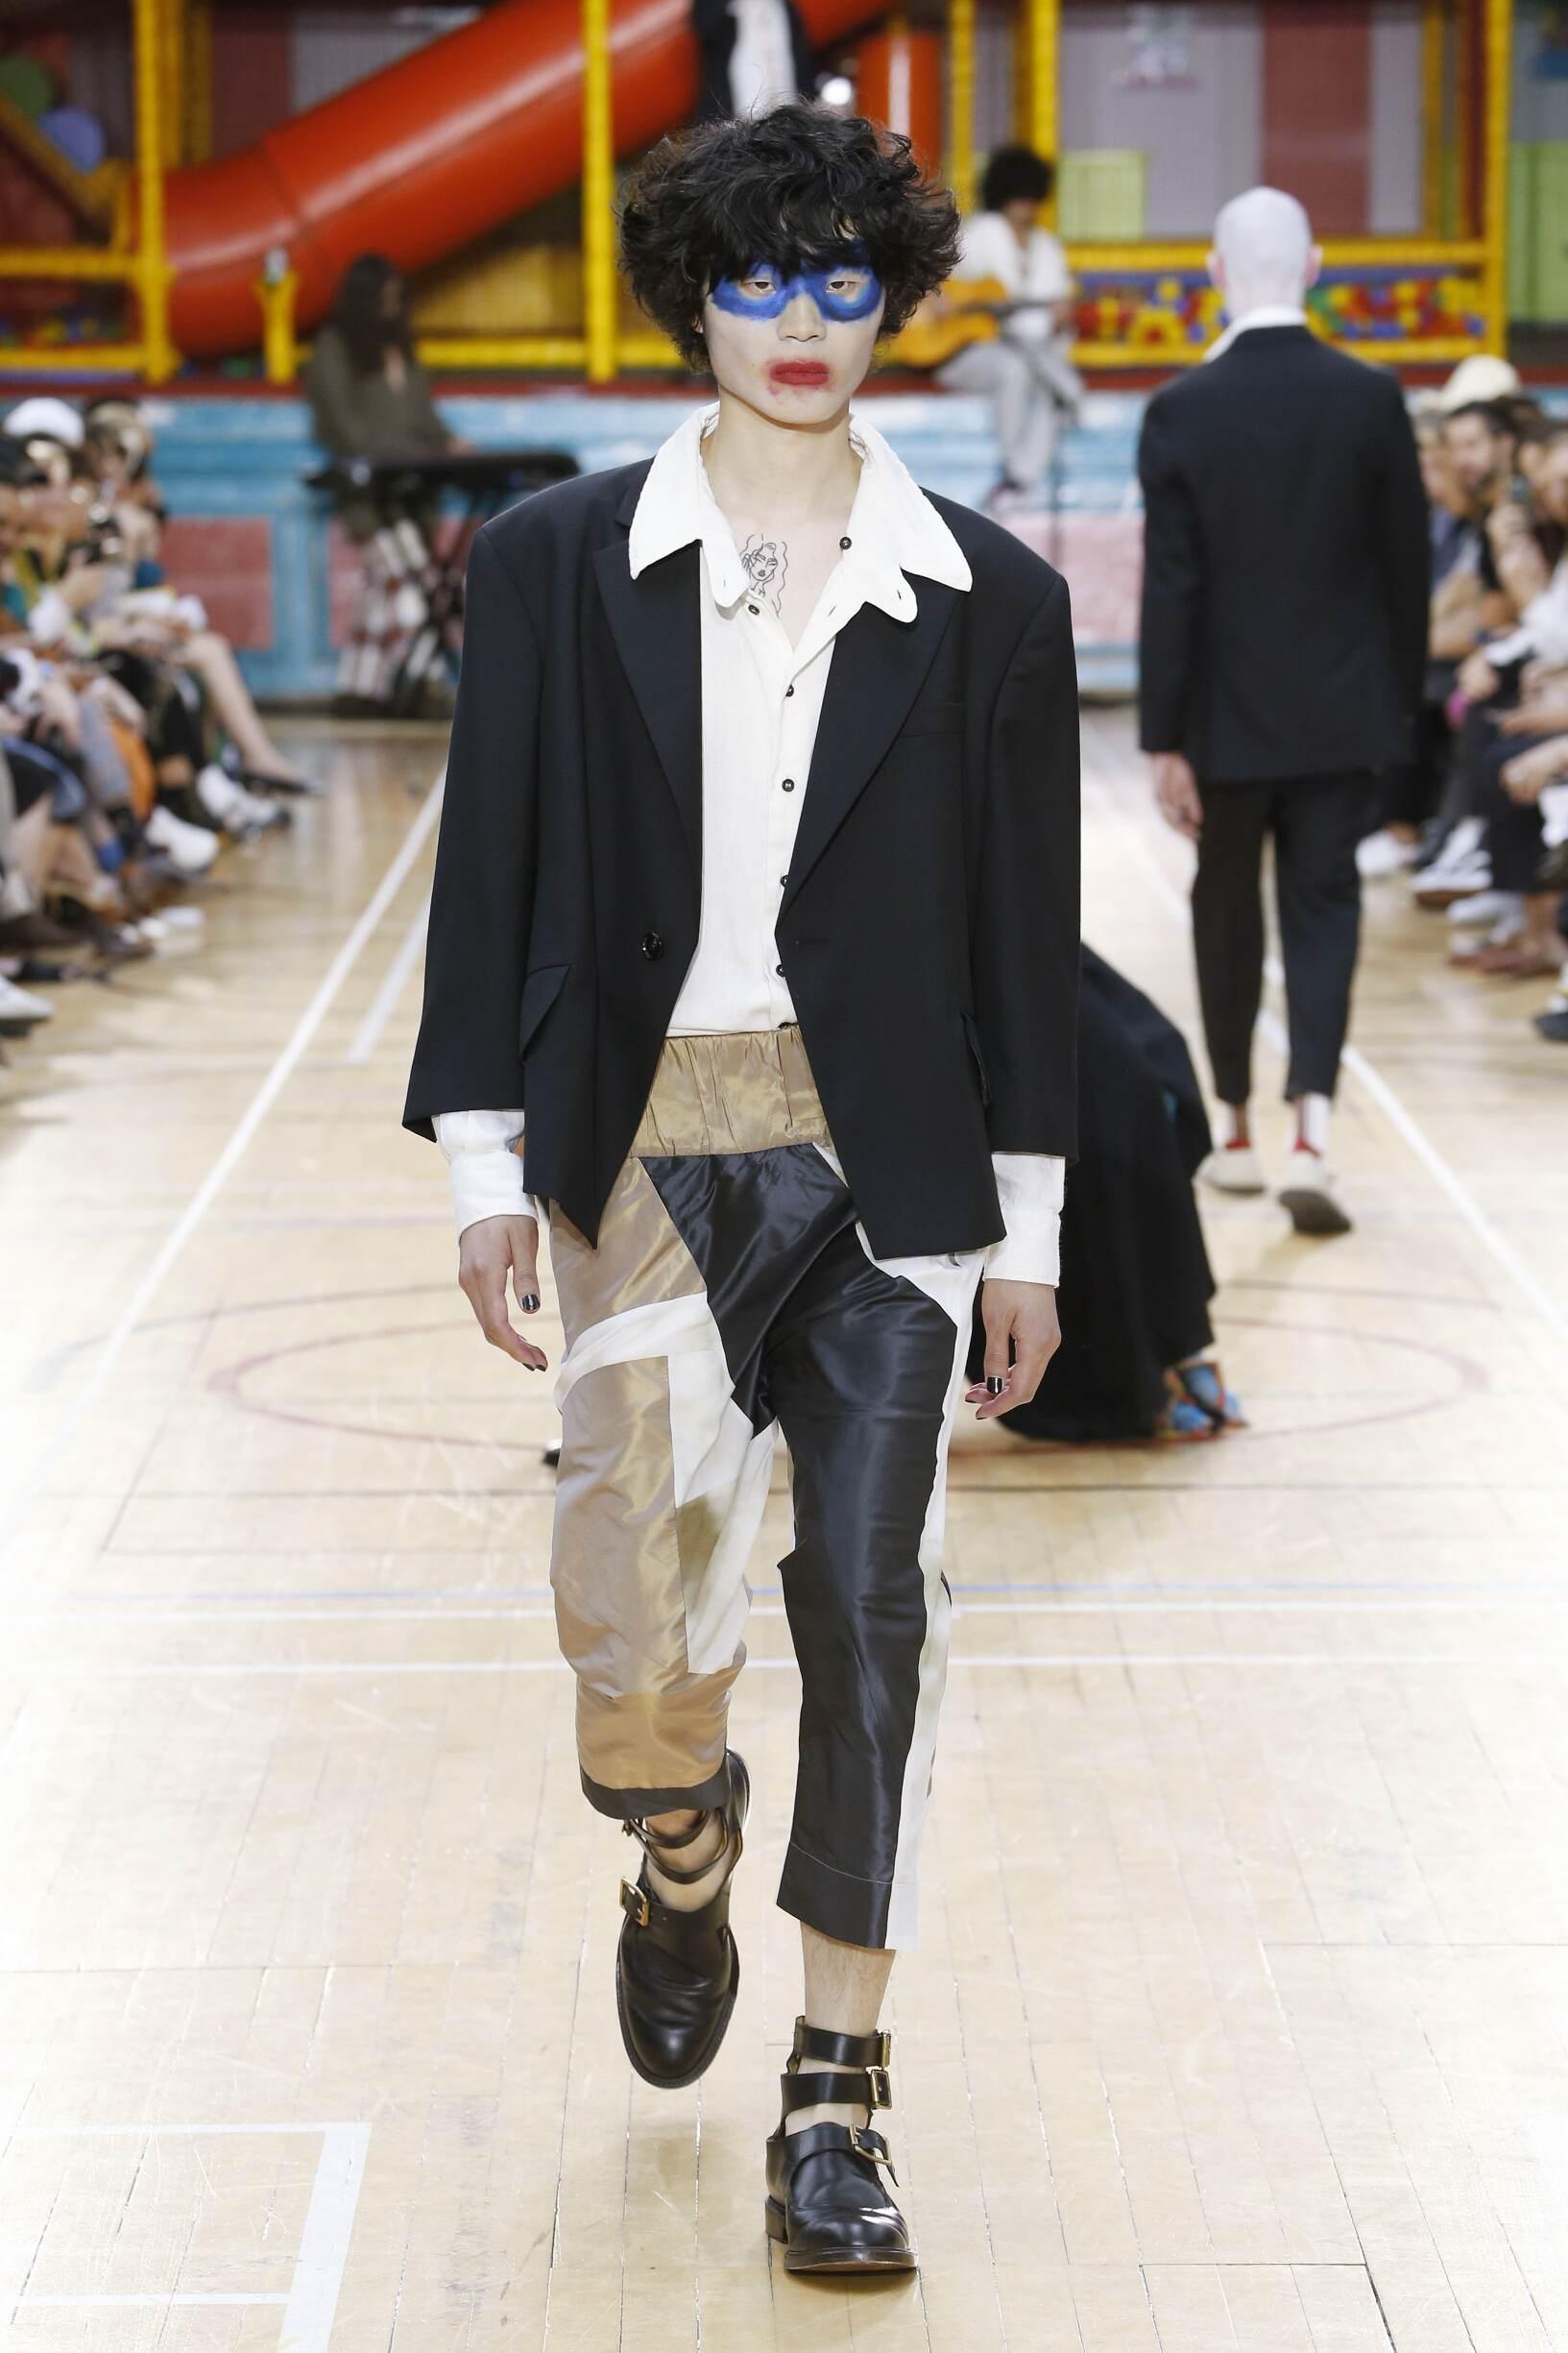 SS 2018 Vivienne Westwood Show London Fashion Week Menswear